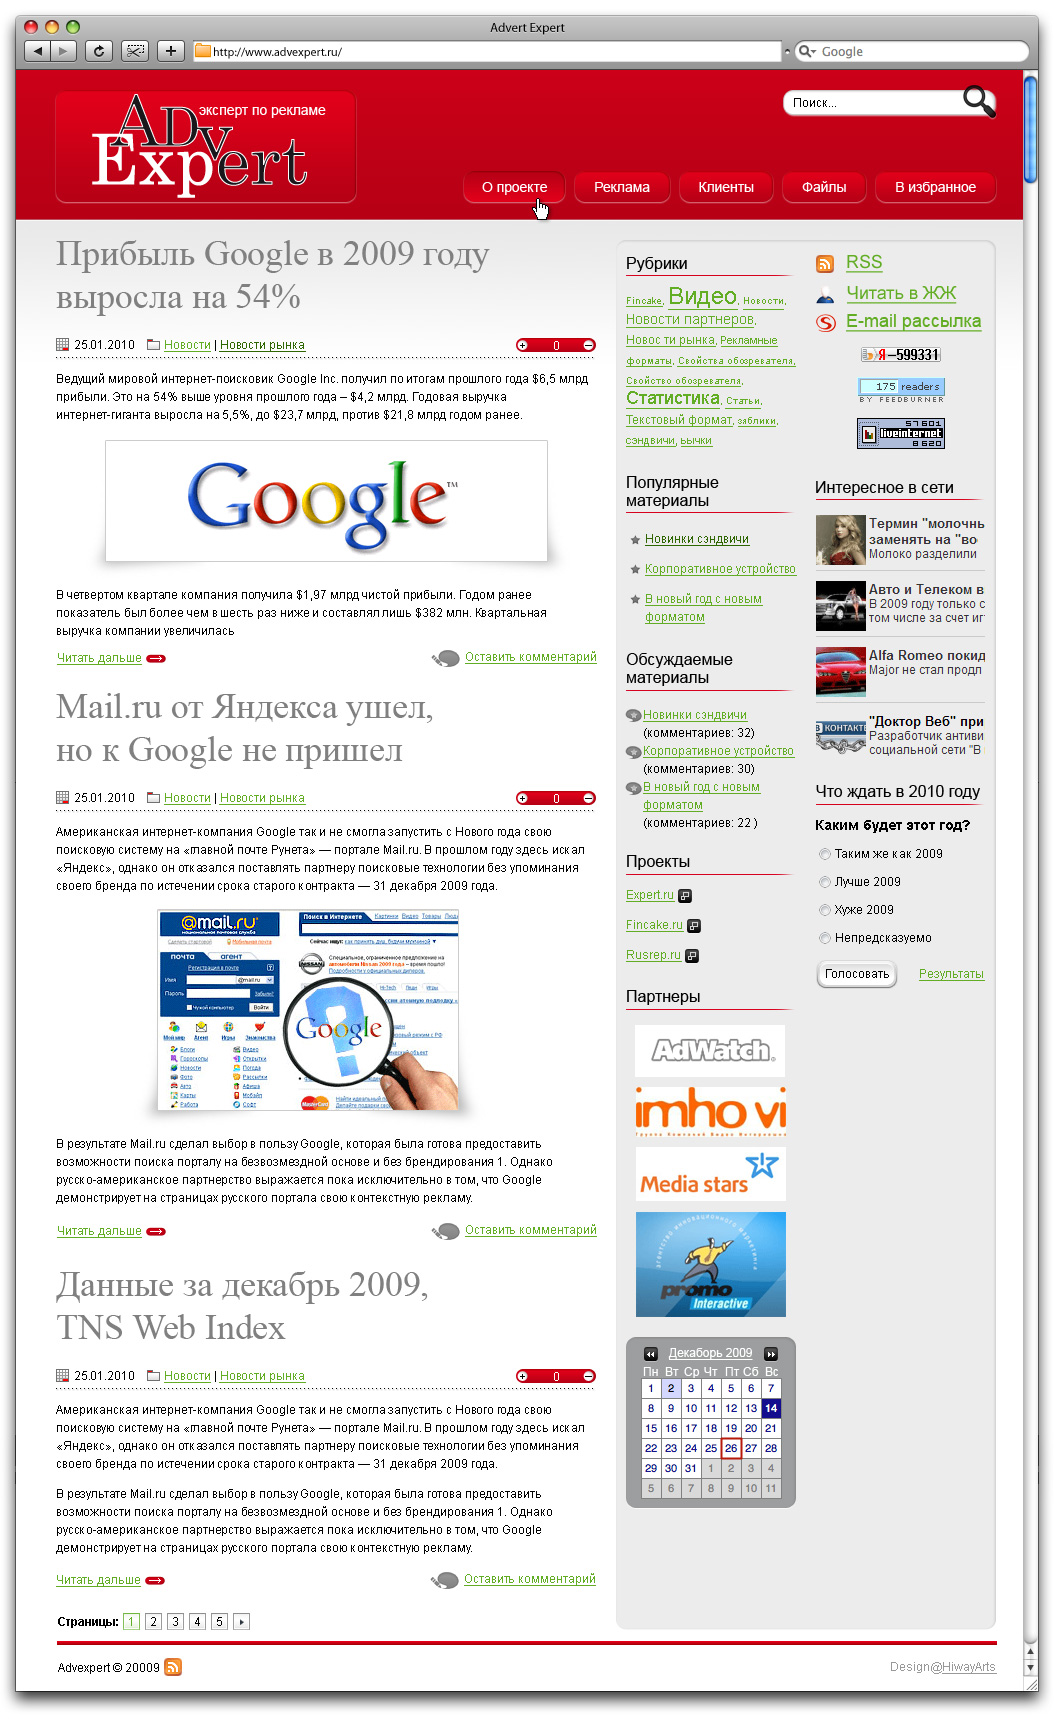 Дизайн блога Advert Expert